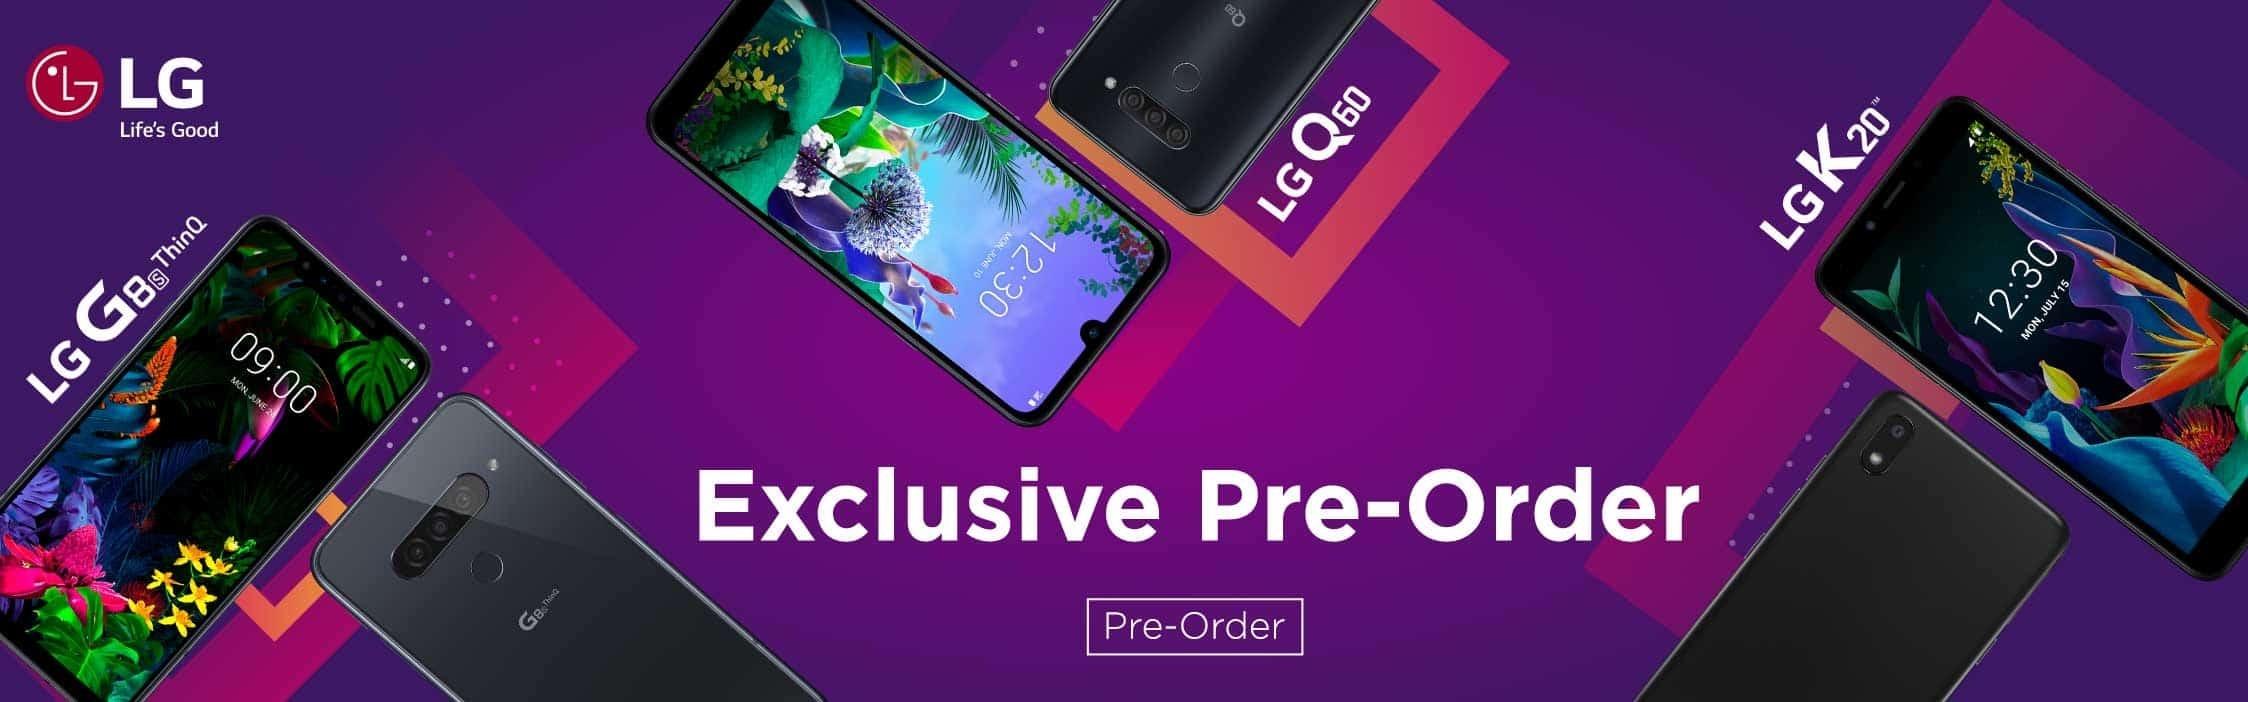 LG Pre Order